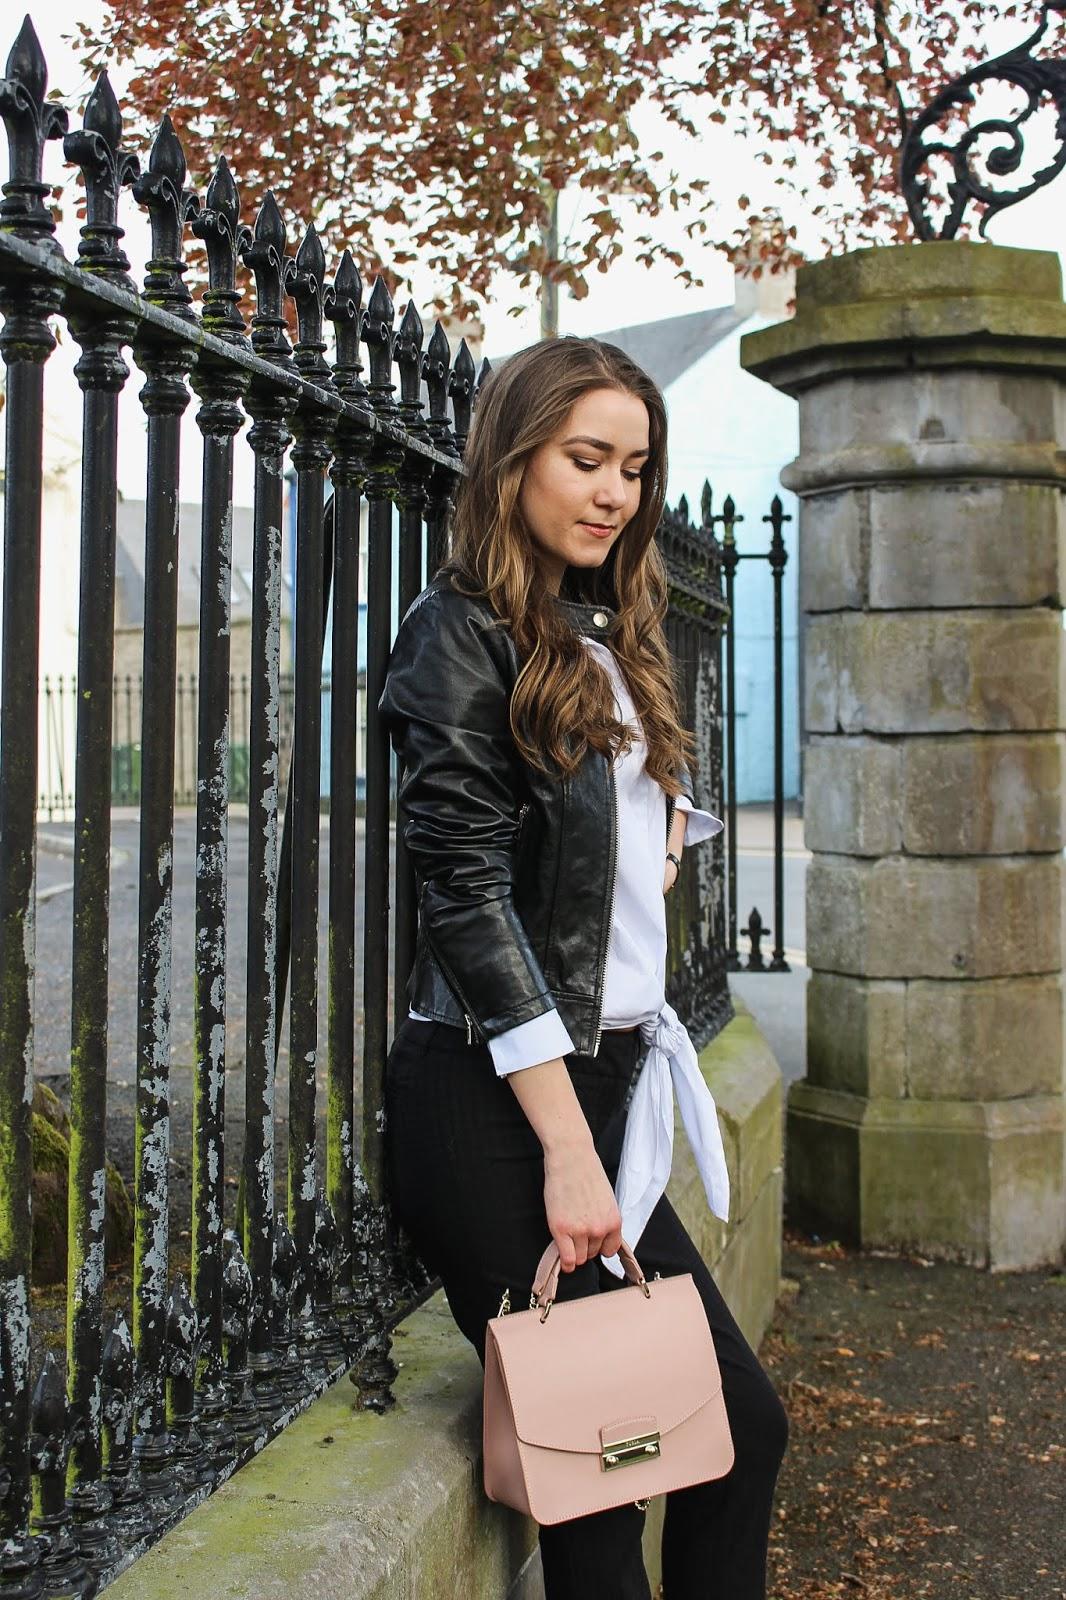 71e7880cc890 Shirt    NA-KD Bag    Furla Watch    Balmain Shoes    BCBG Max Azria